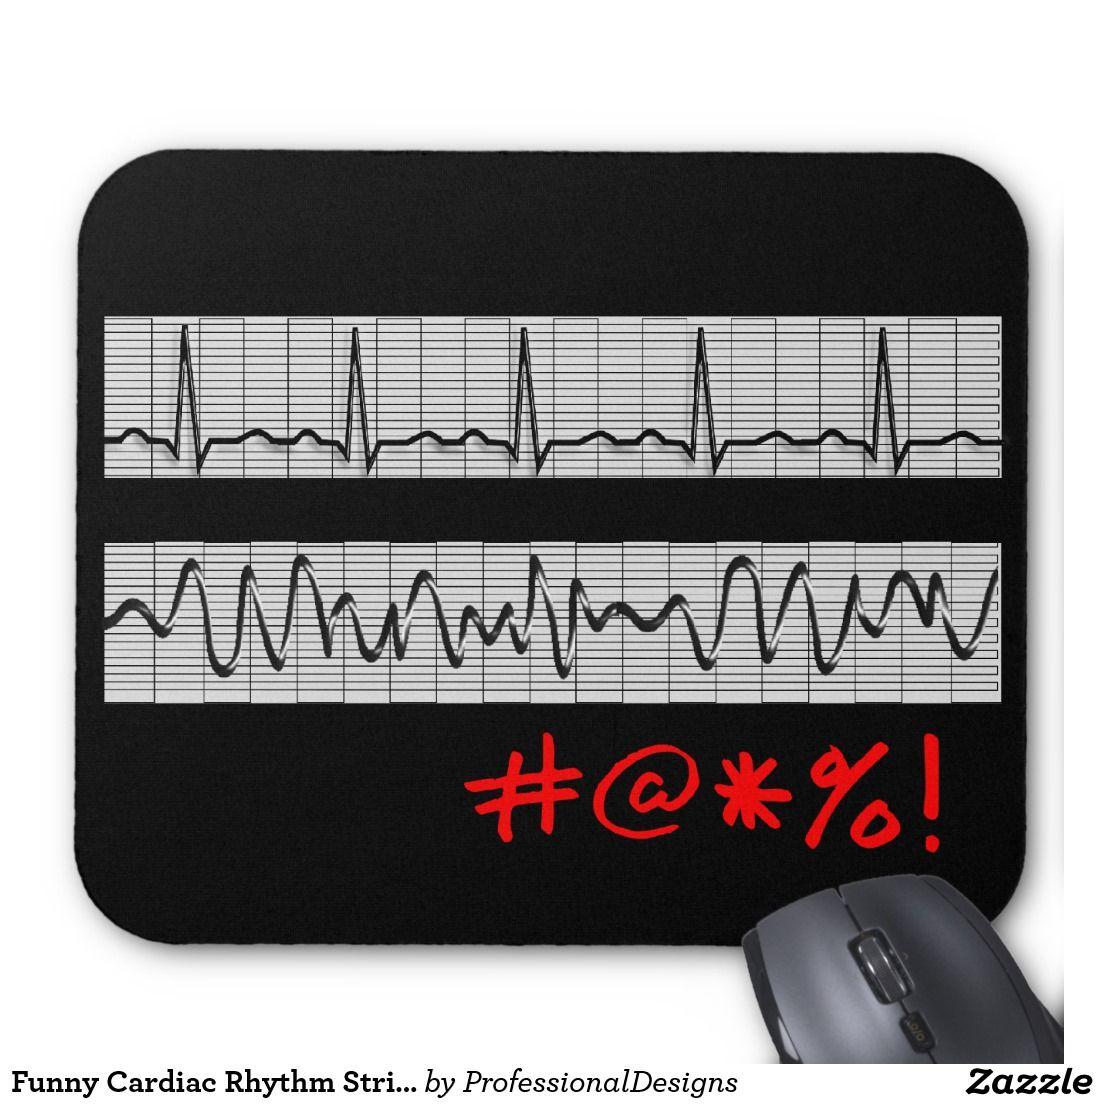 Funny Cardiac Rhythm Strip Gifts Mouse Pad